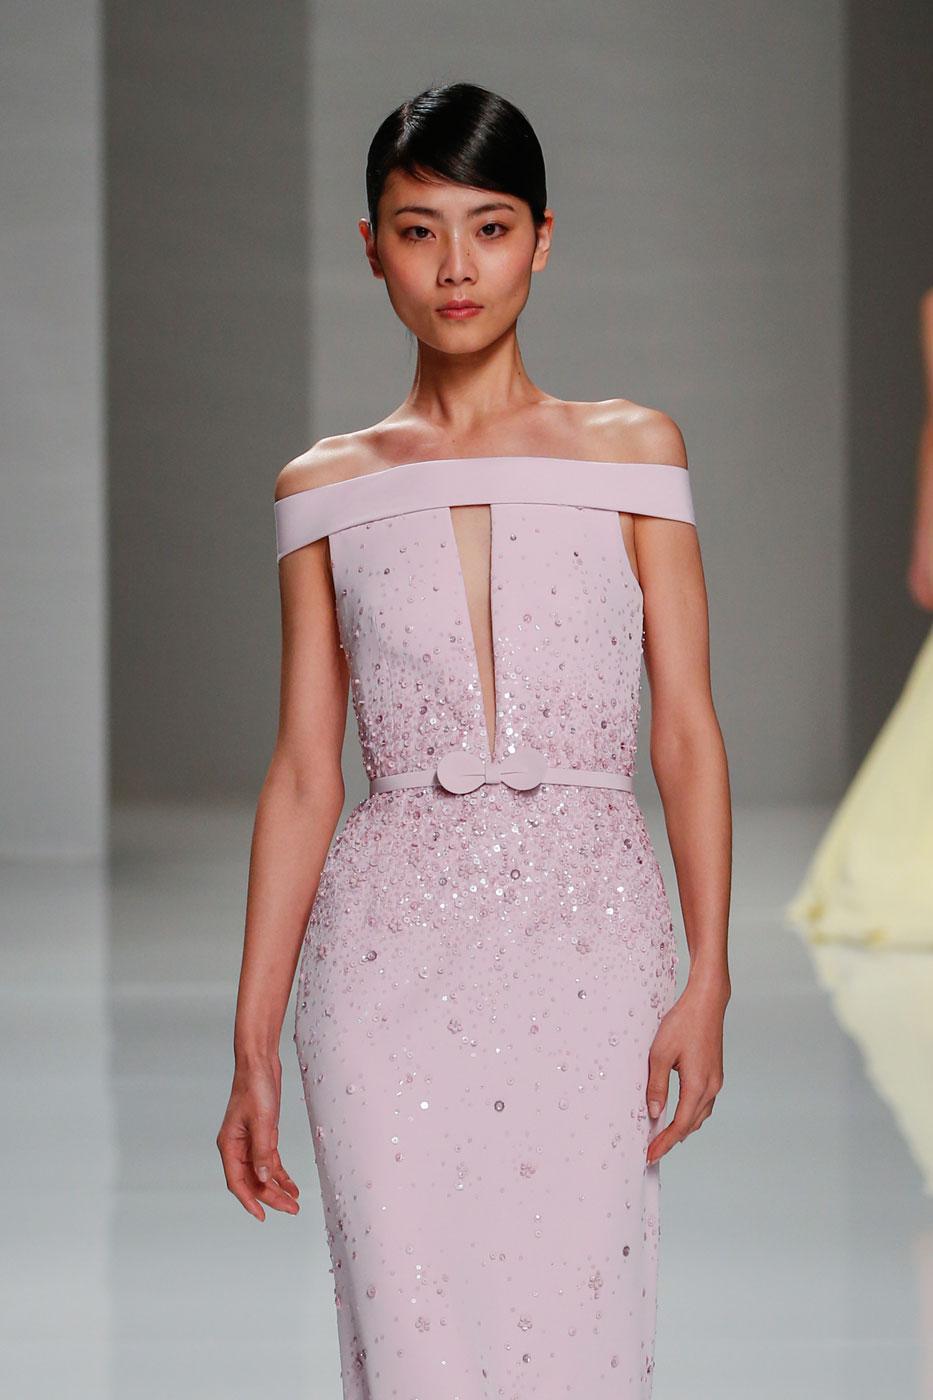 Georges-Hobeika-fashion-runway-show-haute-couture-paris-spring-2015-the-impression-26